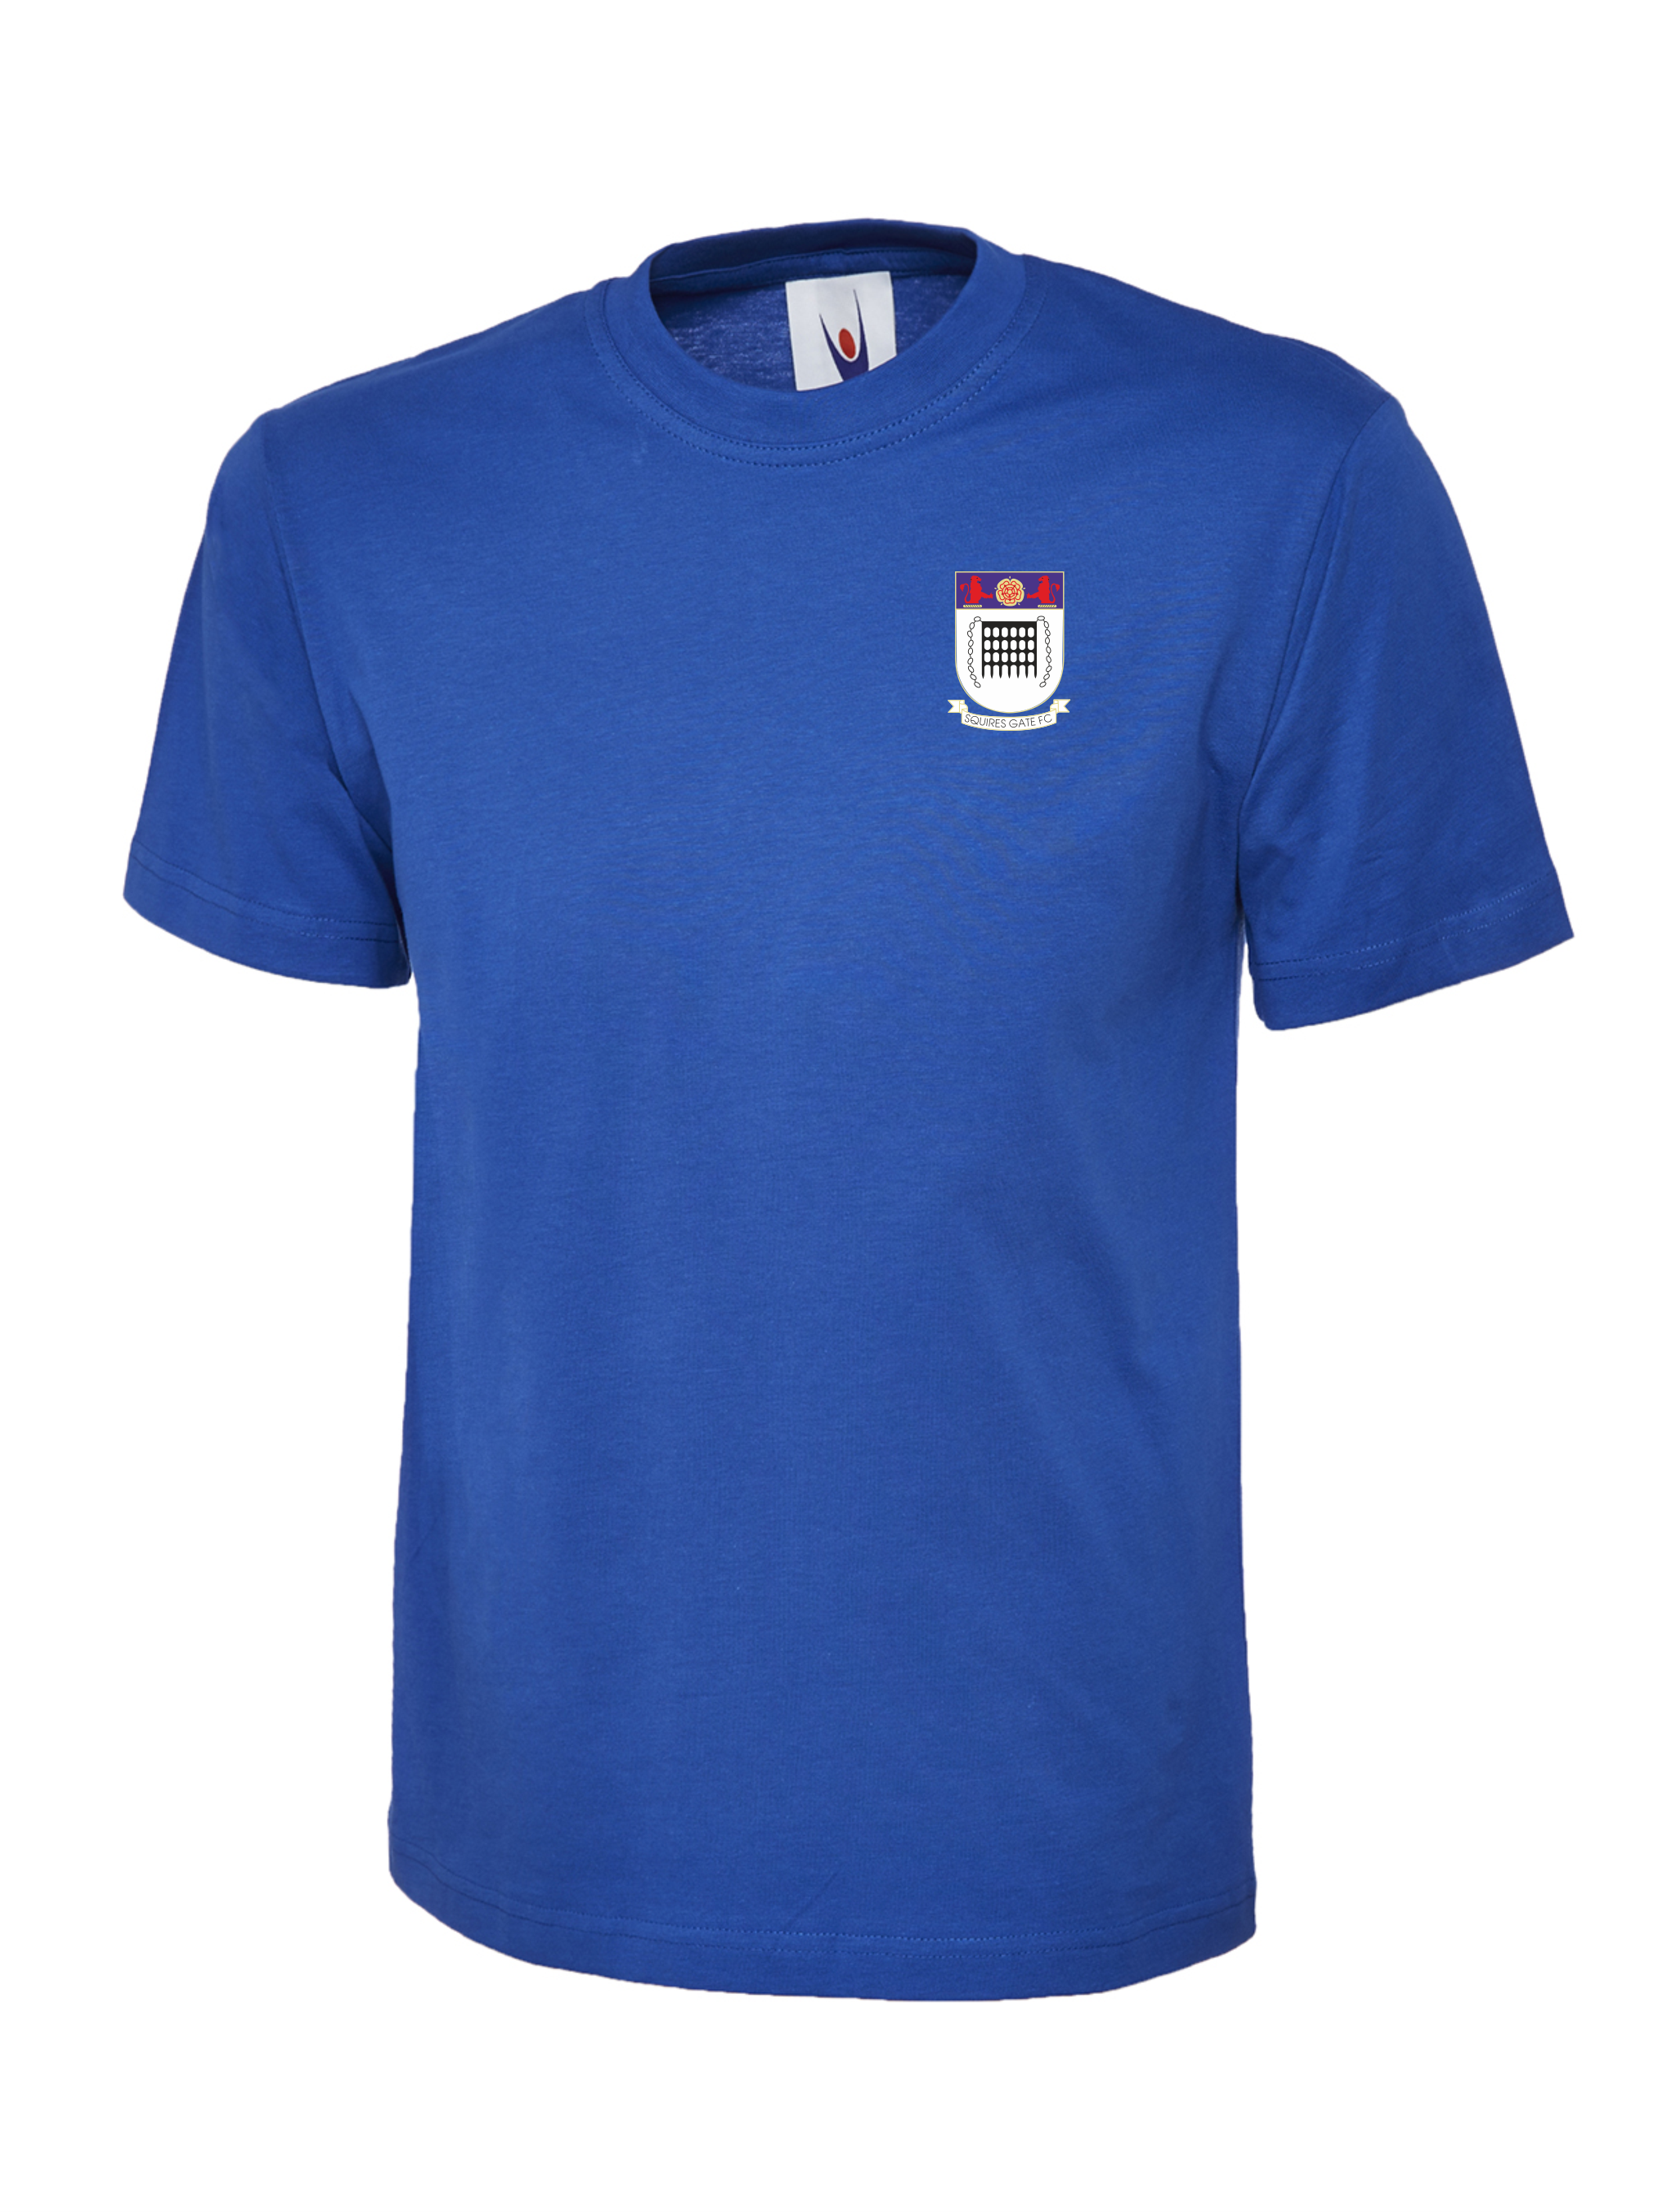 Squires Gate Blue T Shirt